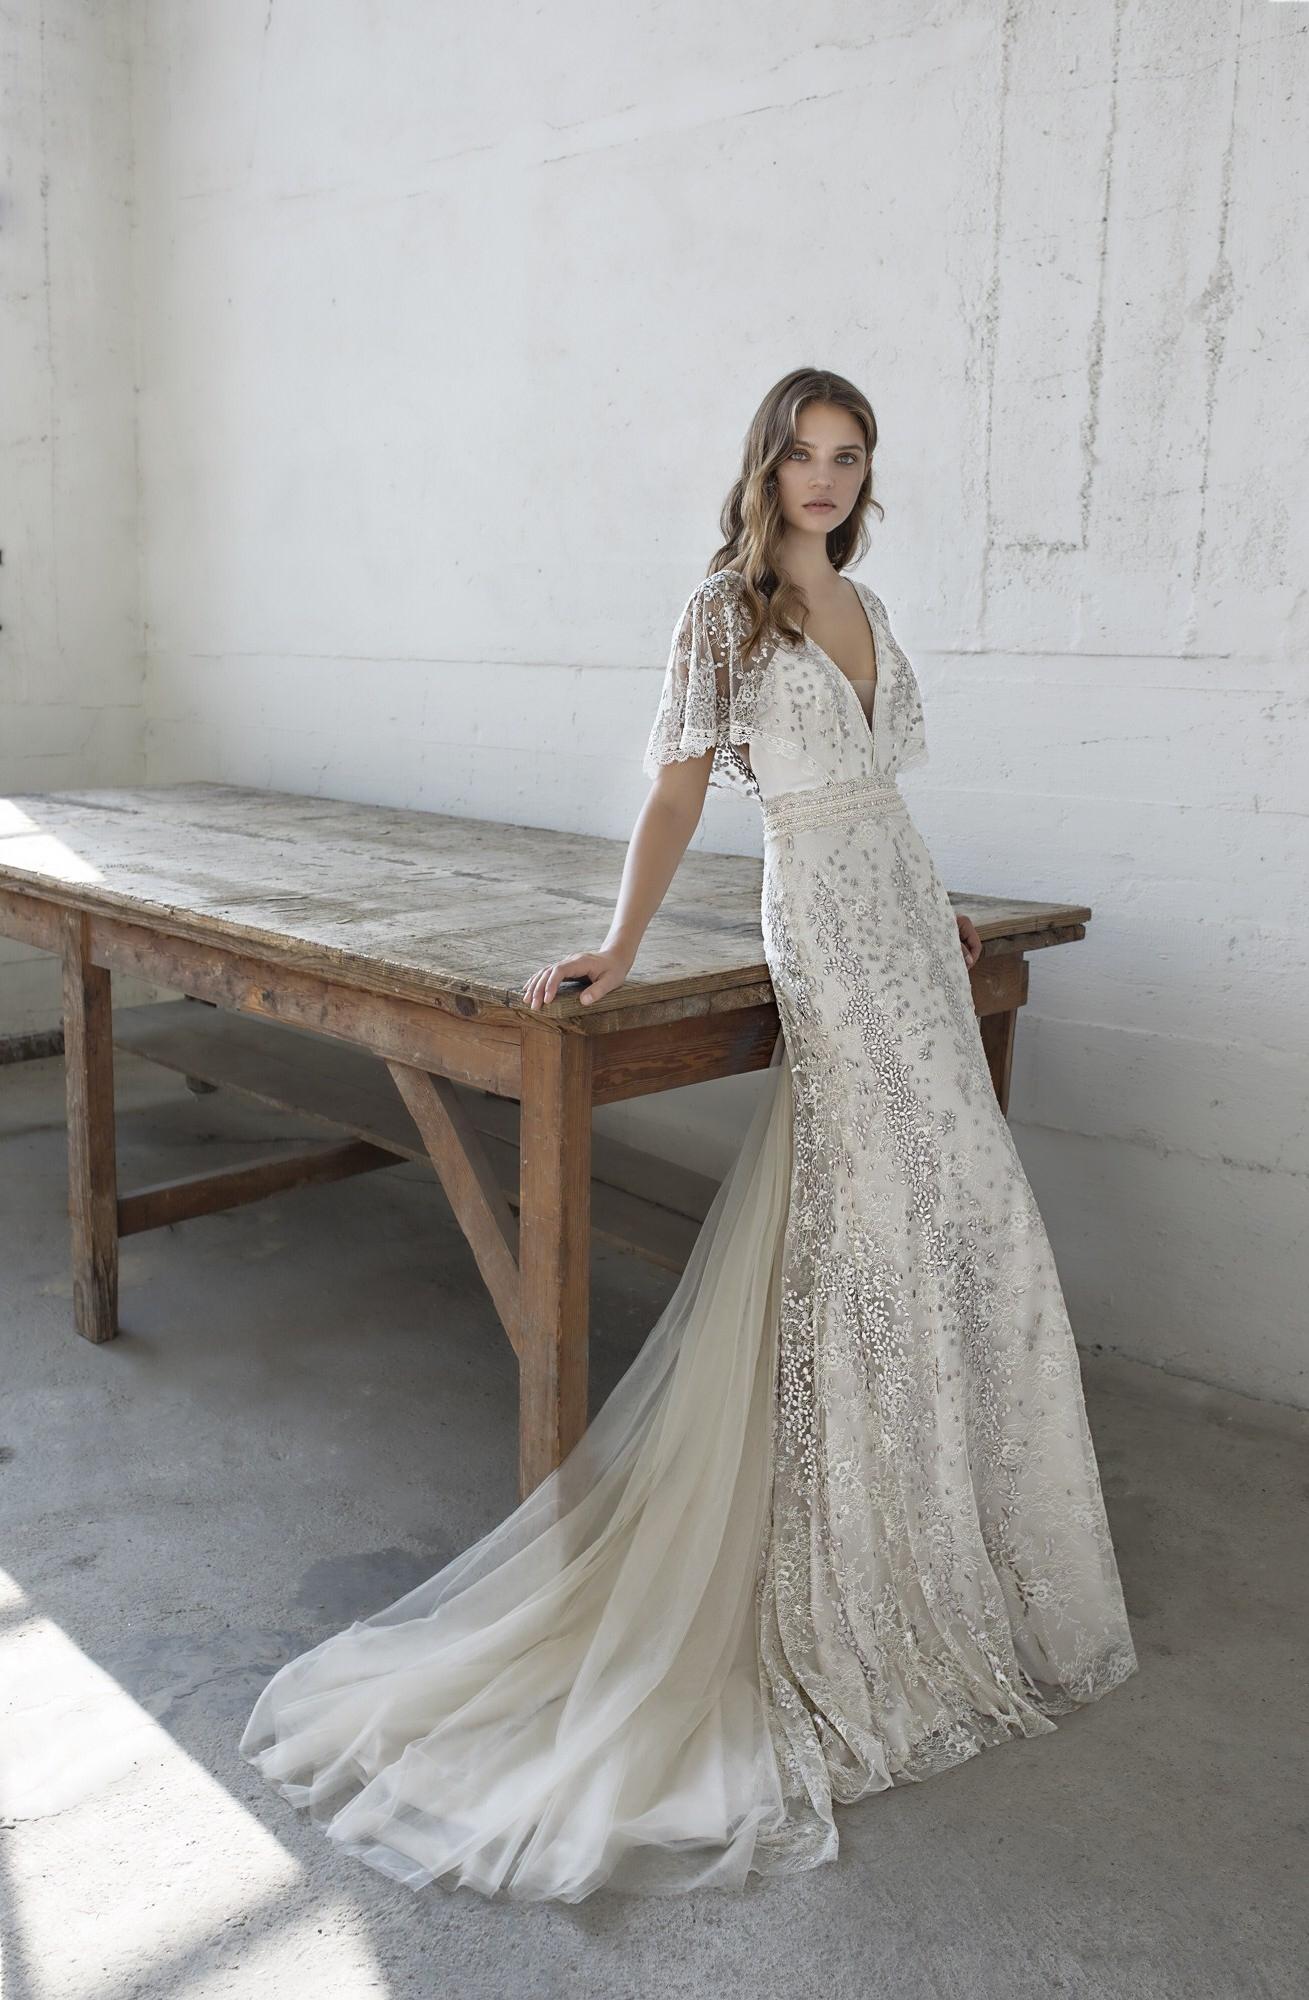 Modeca Le Papillon Eden Trouwjurk Eden Wedding Dress Boho Wedding Dress Lace Sheath Wedding Dress [ 2000 x 1309 Pixel ]